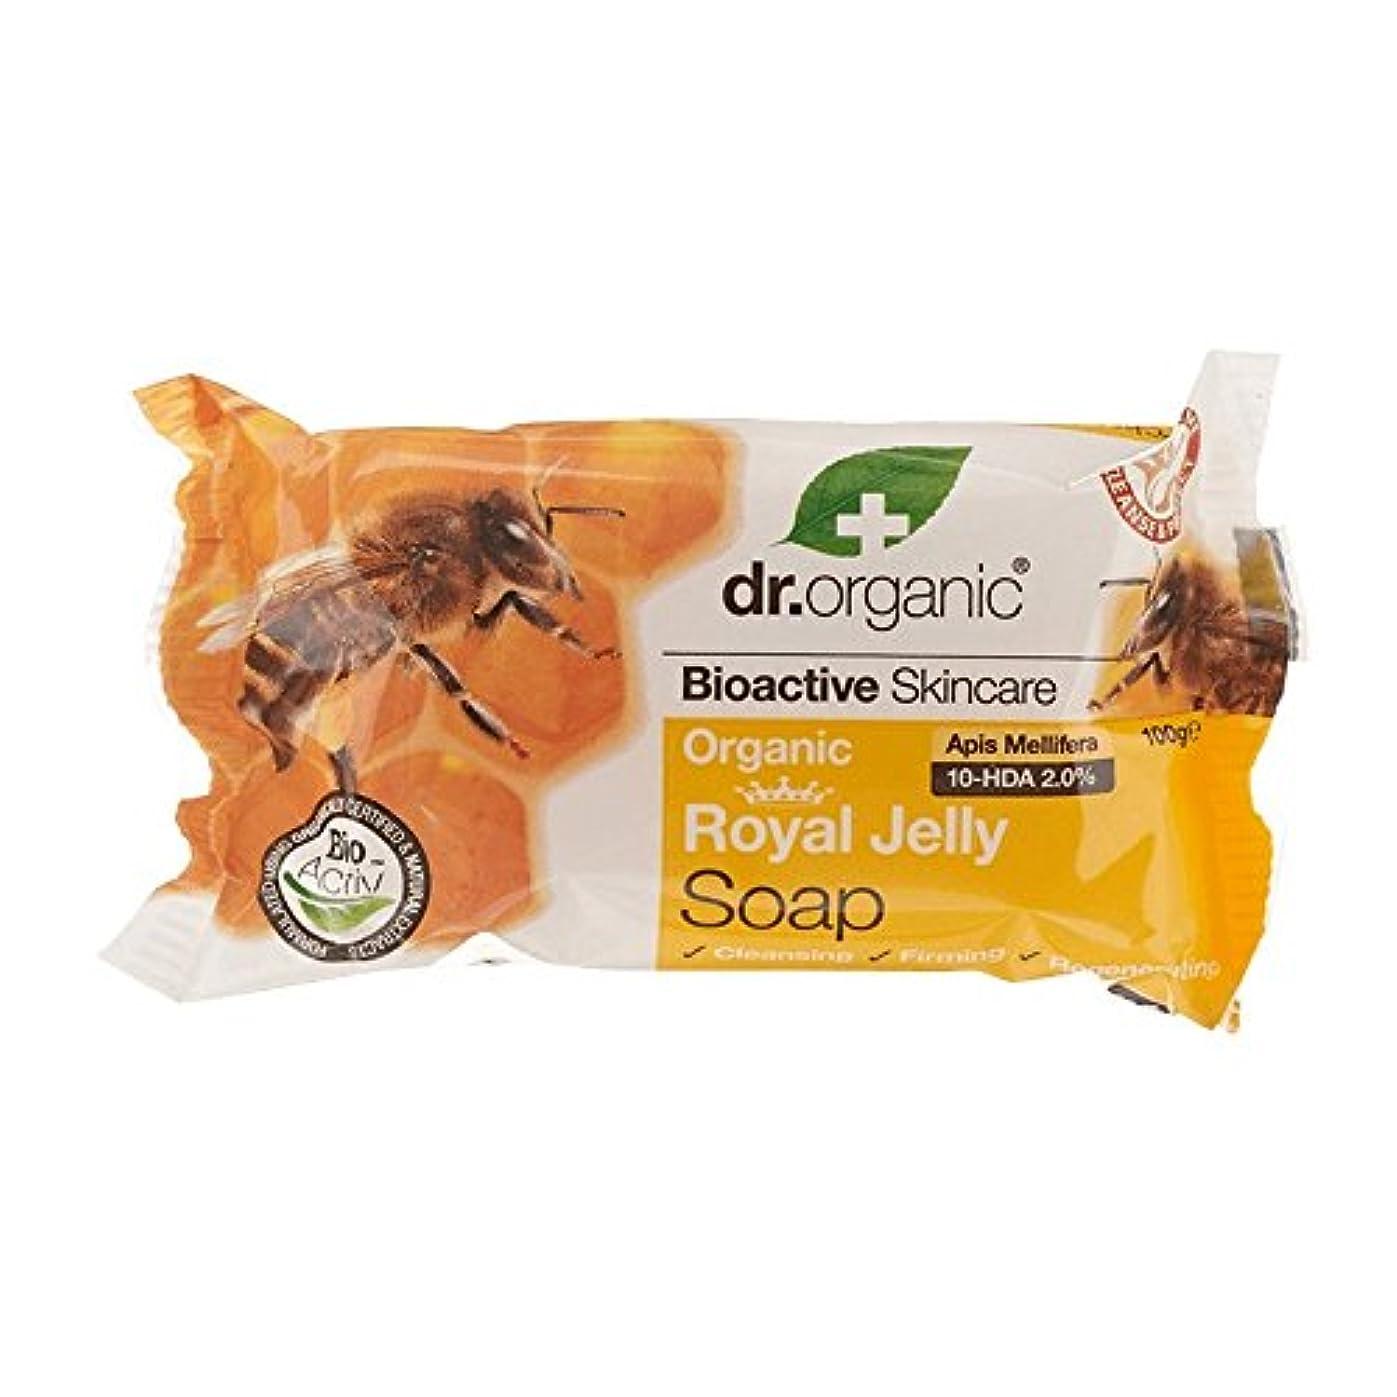 Dr有機ローヤルゼリーソープ - Dr Organic Royal Jelly Soap (Dr Organic) [並行輸入品]